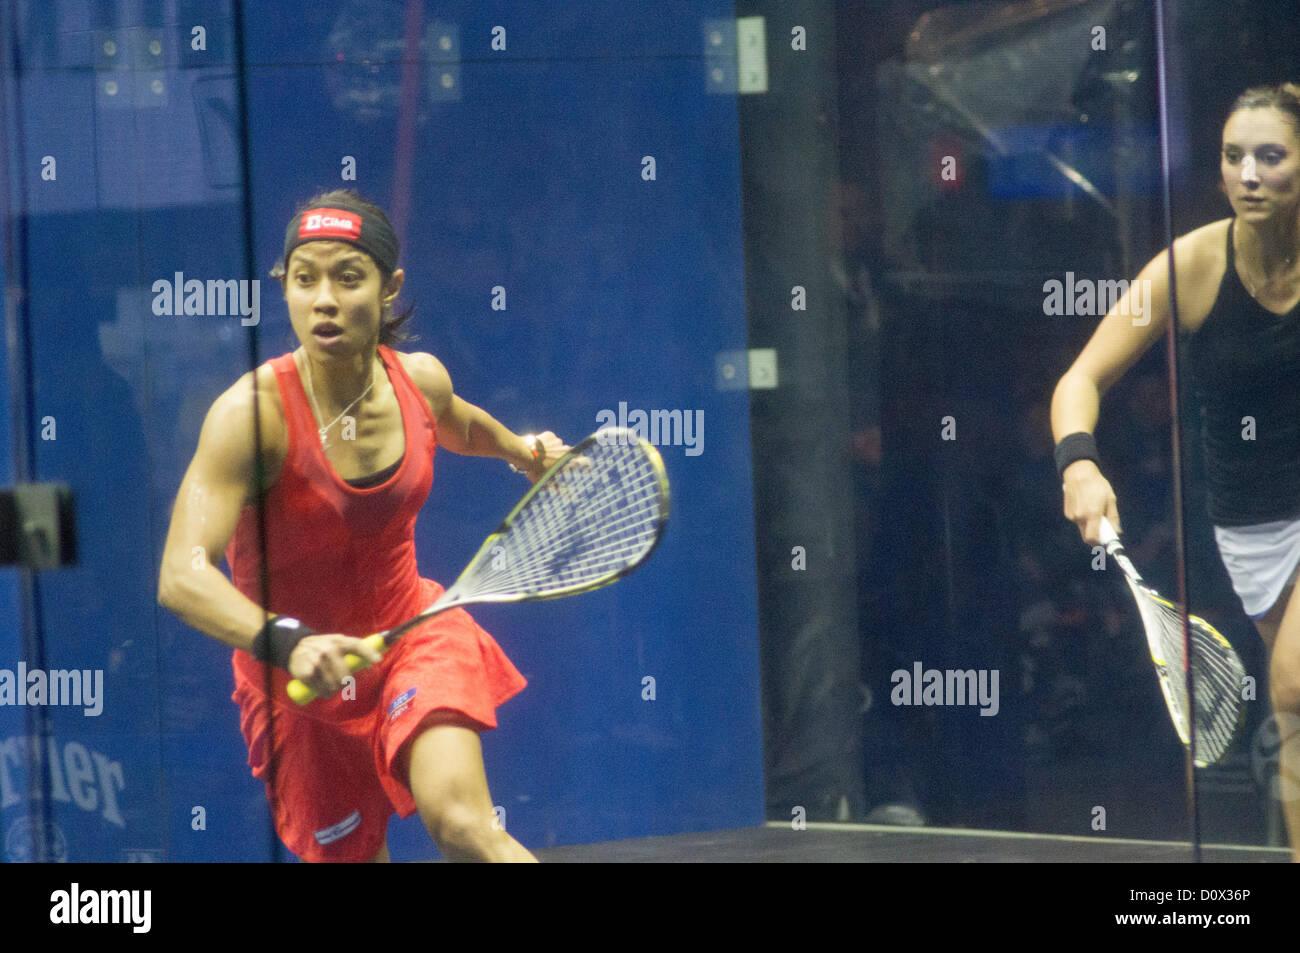 Women Final of Cathay Pacific Sun Hung Kai Financial Hong Kong Squash Open 2012- 2 Dec, 2012. Nicol David vs Camille - Stock Image